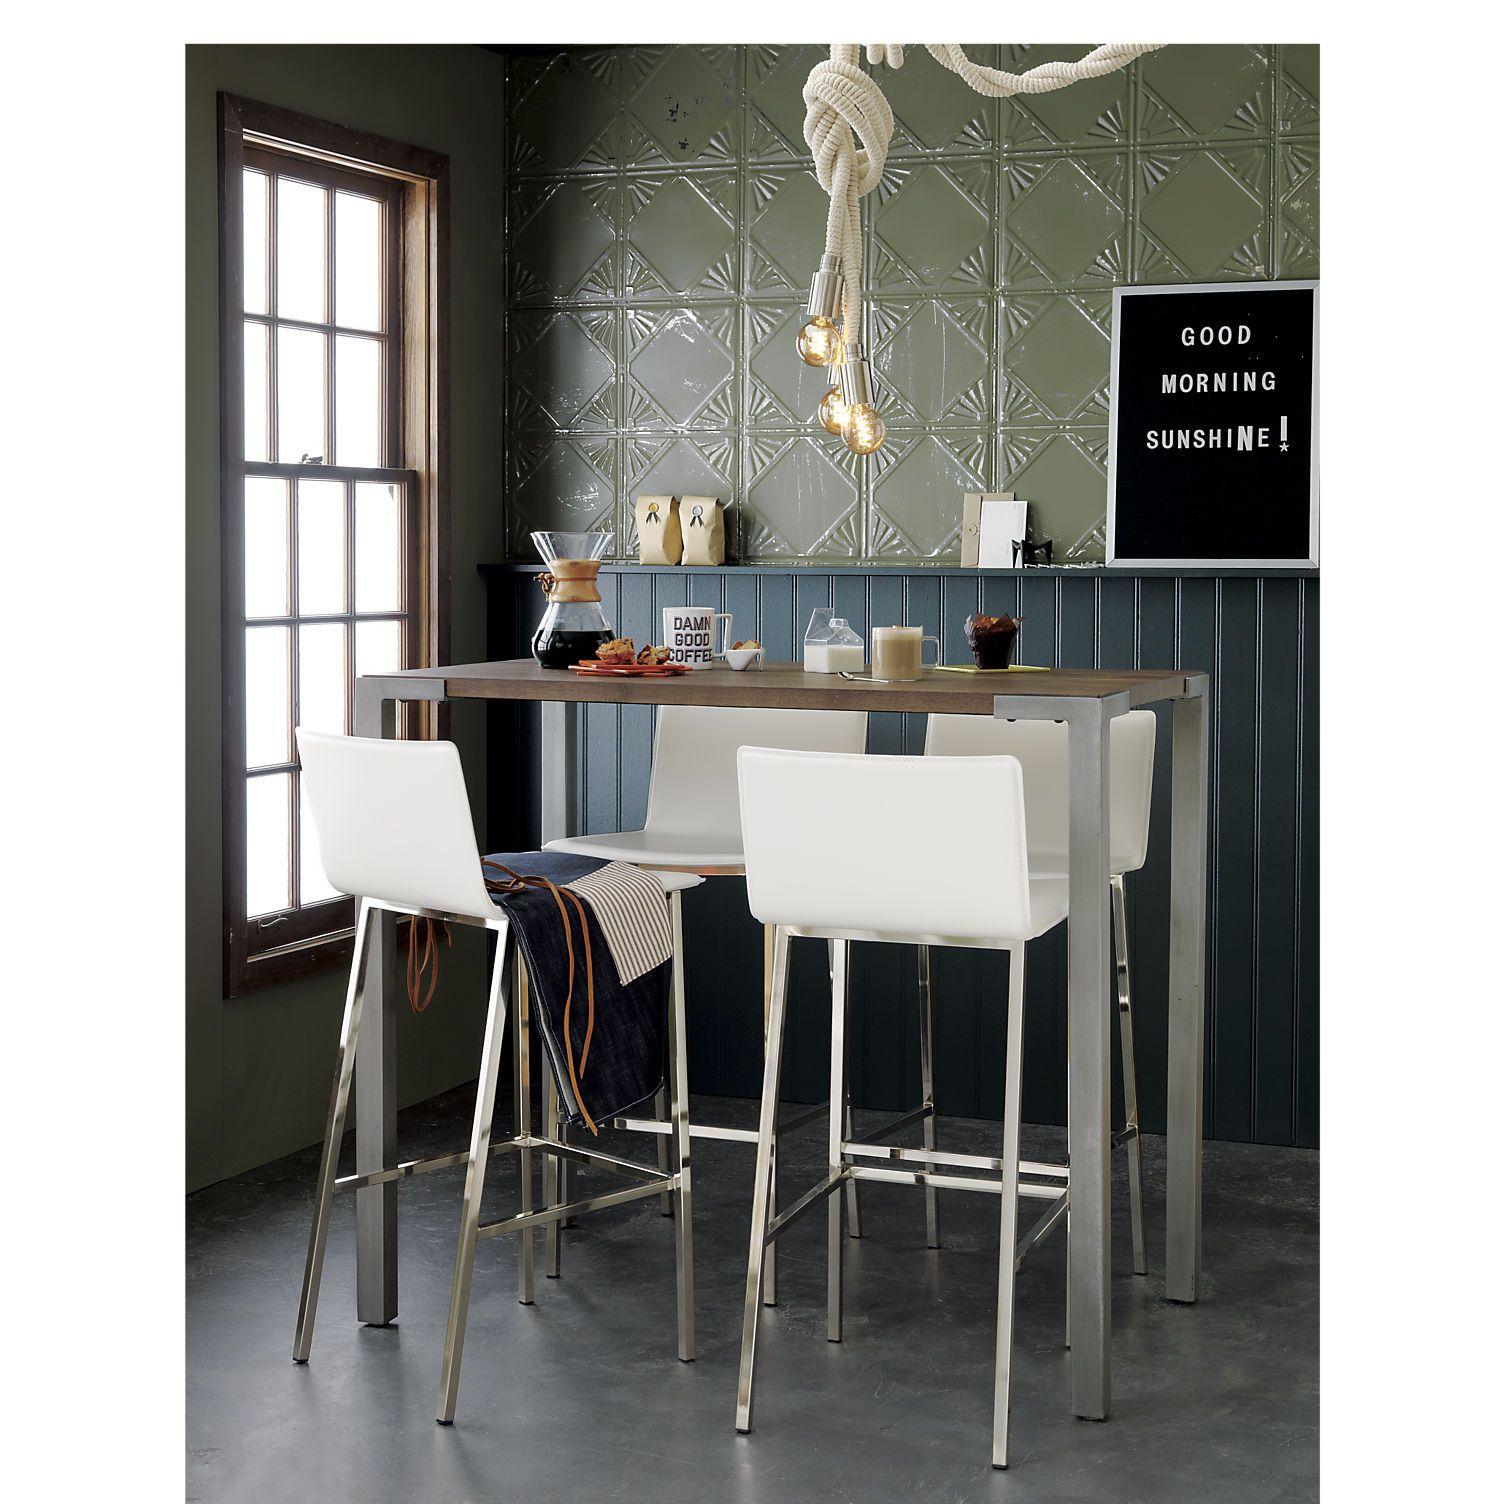 stilt 42   high dining table   cb2 stilt 42     high dining table   kitchen island bar industrial      rh   pinterest com